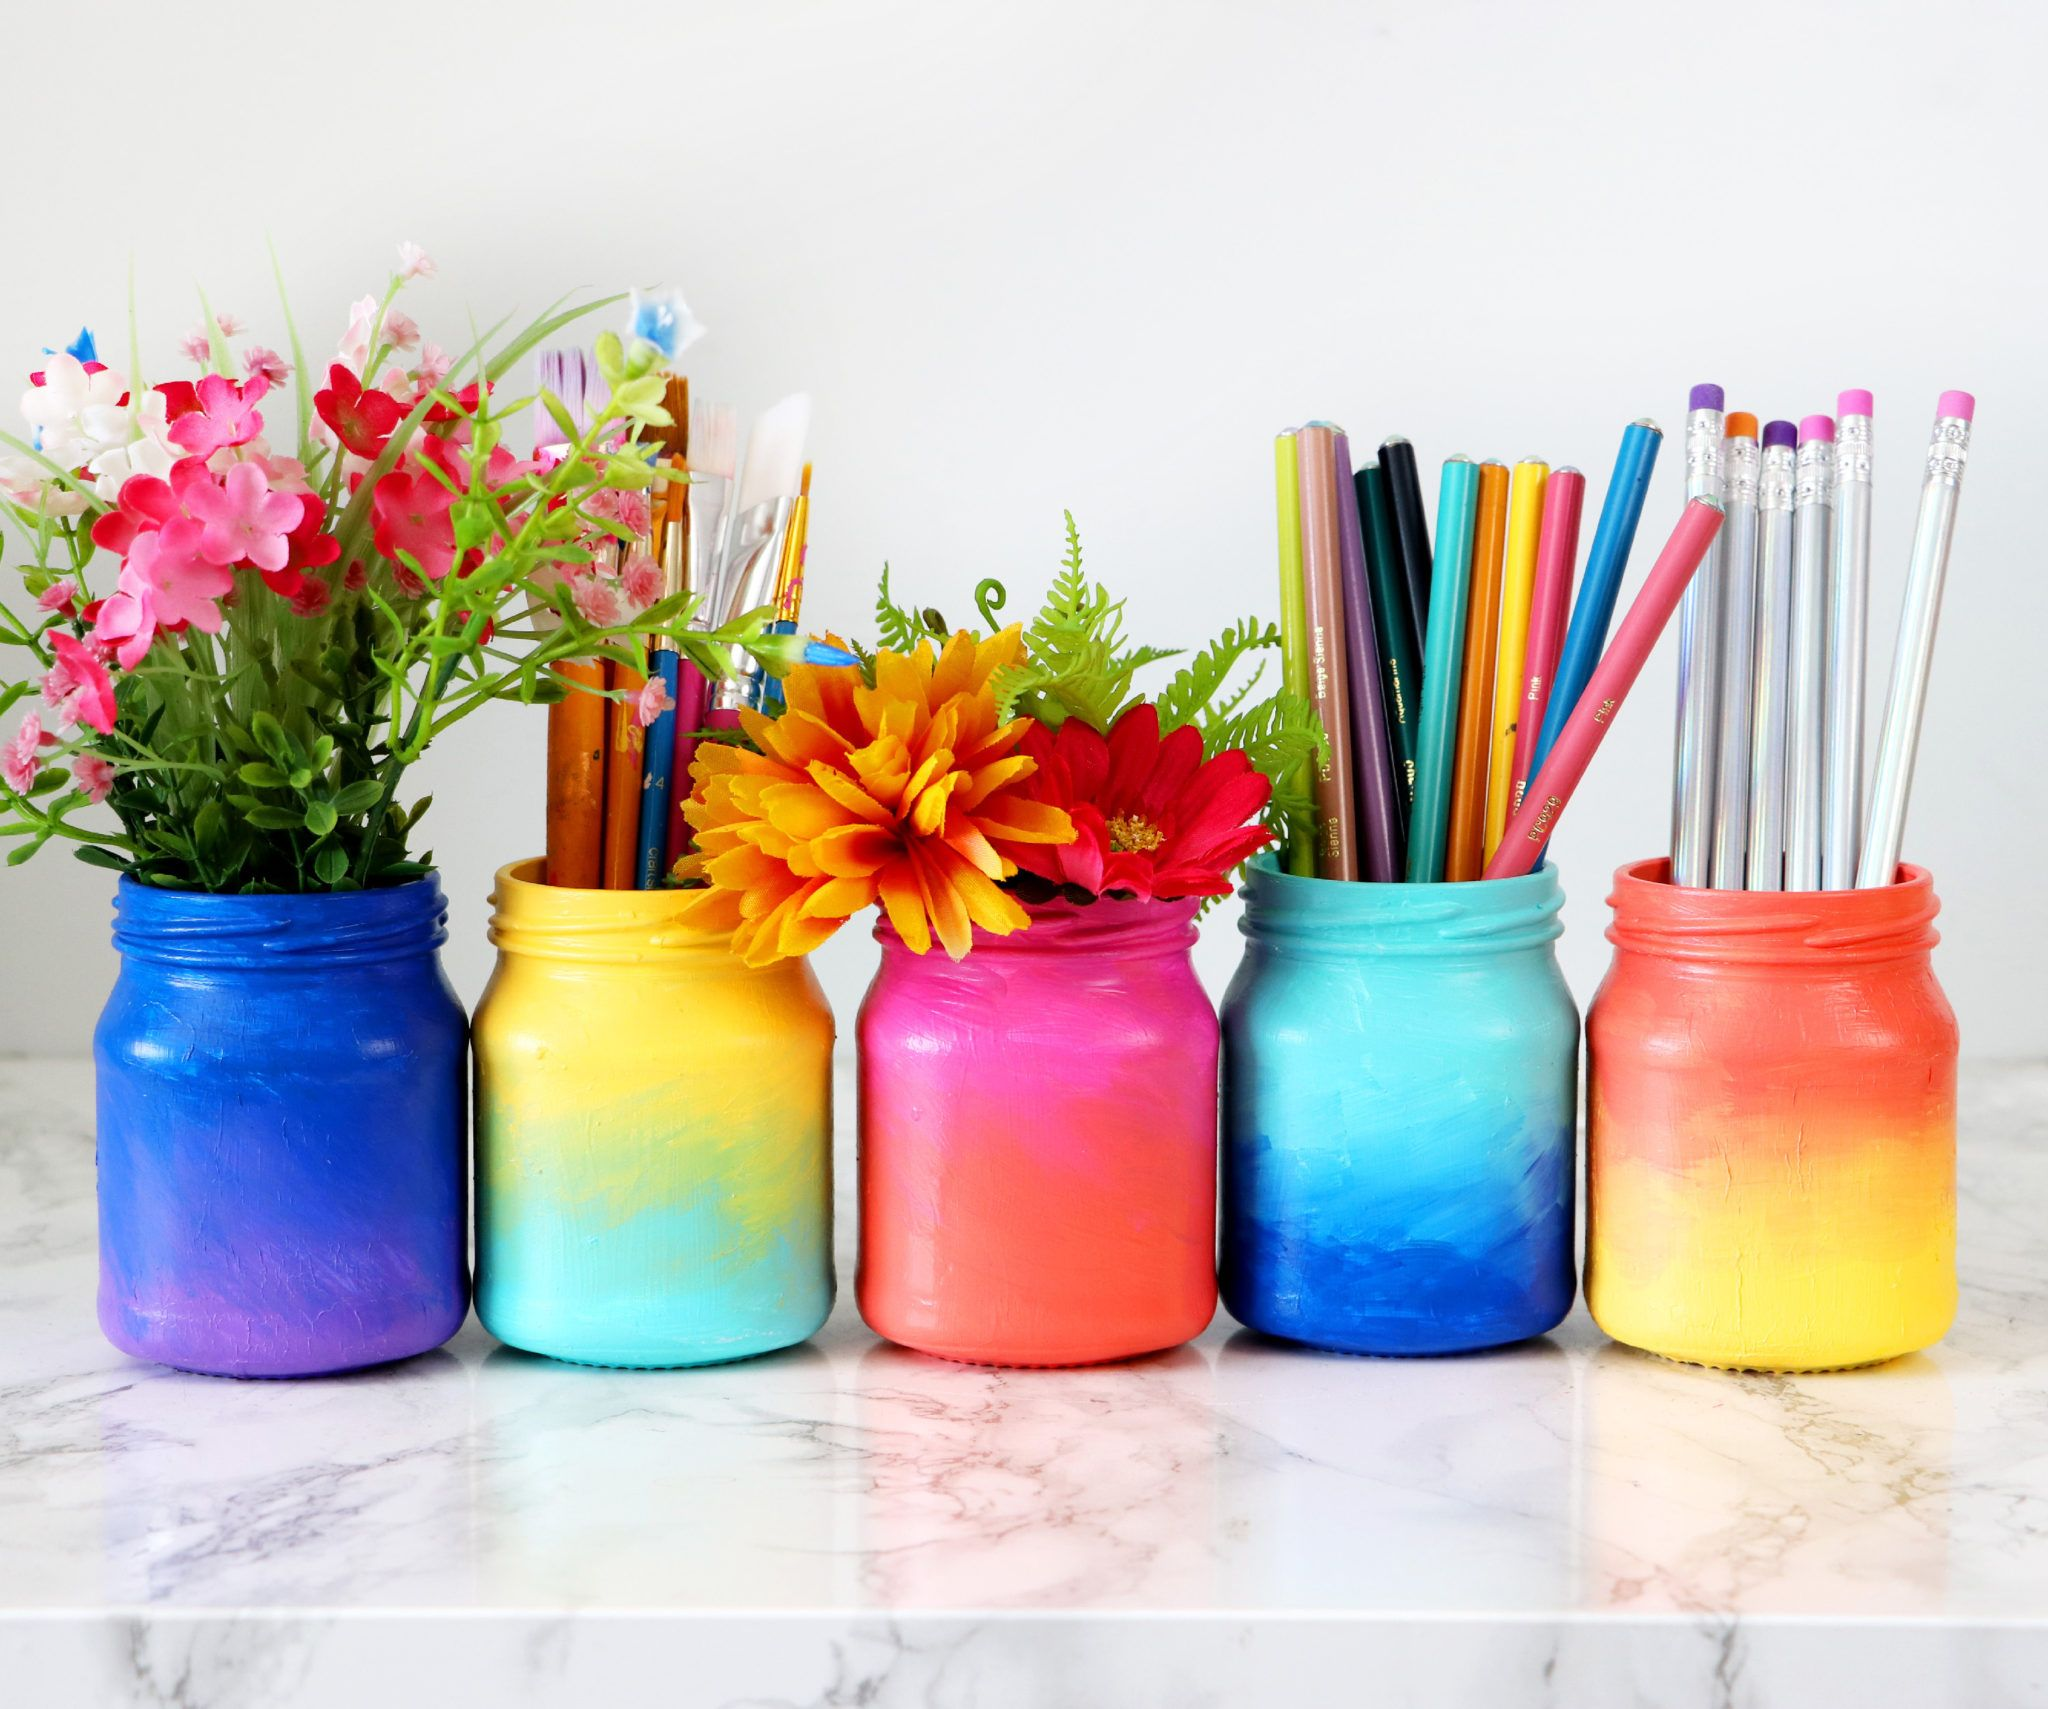 Pinterest Decor Crafts: 3 Ways To Decorate Glass Jars